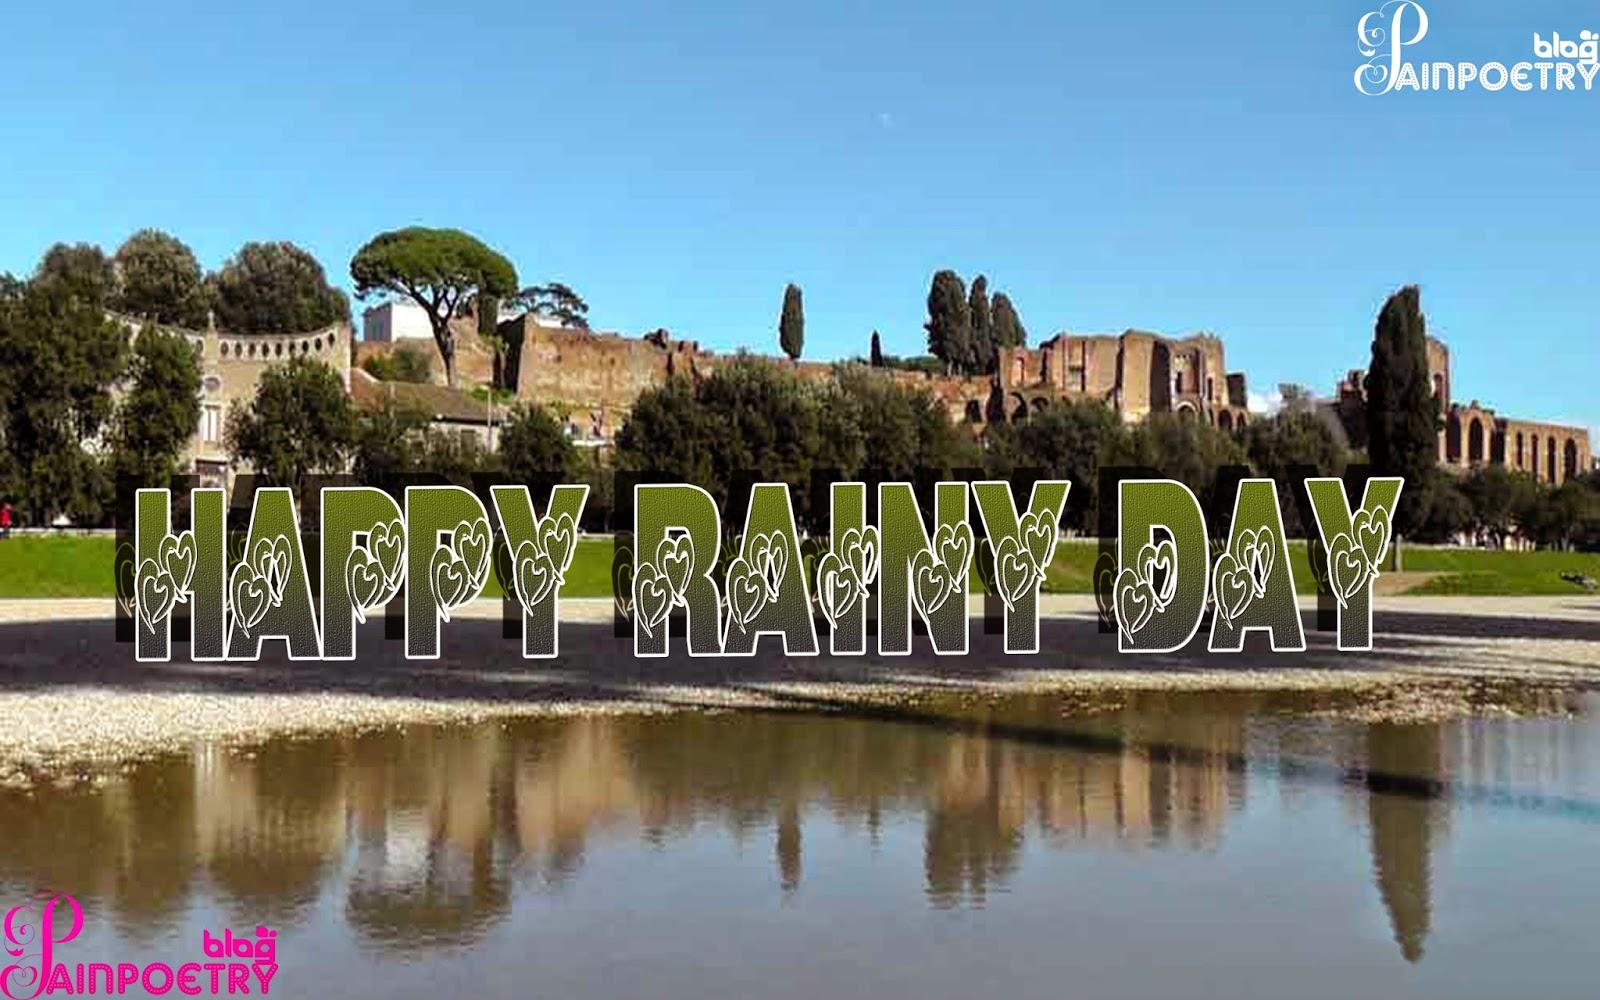 Rainy-Day-Image-Wallpaper-Photo-HD-Wide